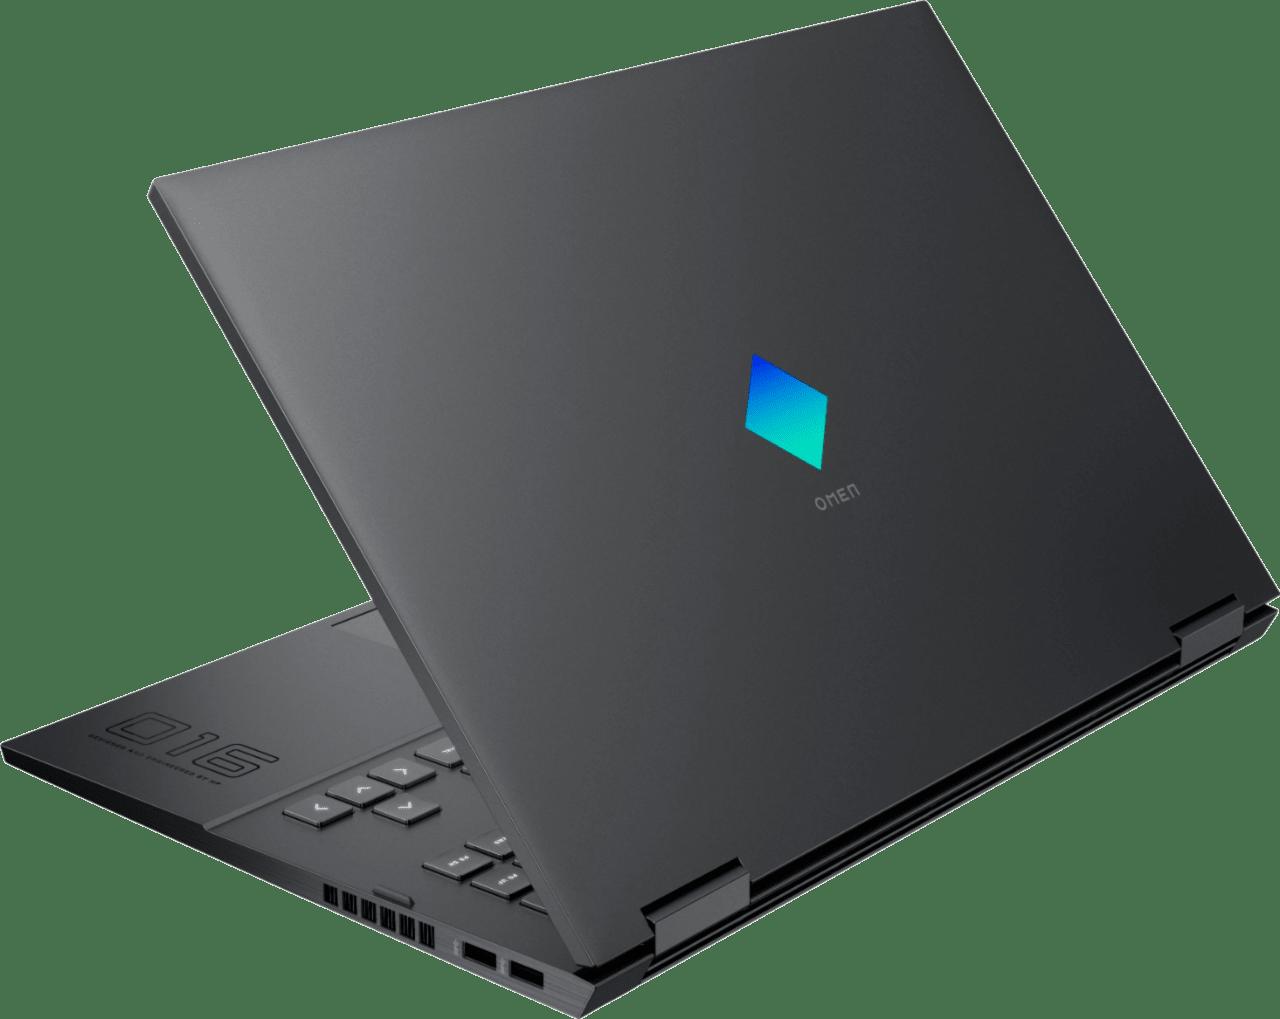 Black HP OMEN - Advantage Edition Laptop - AMD Ryzen 7 - 16GB - AMD Radeon™ RX 6600M - 1TB SSD.4